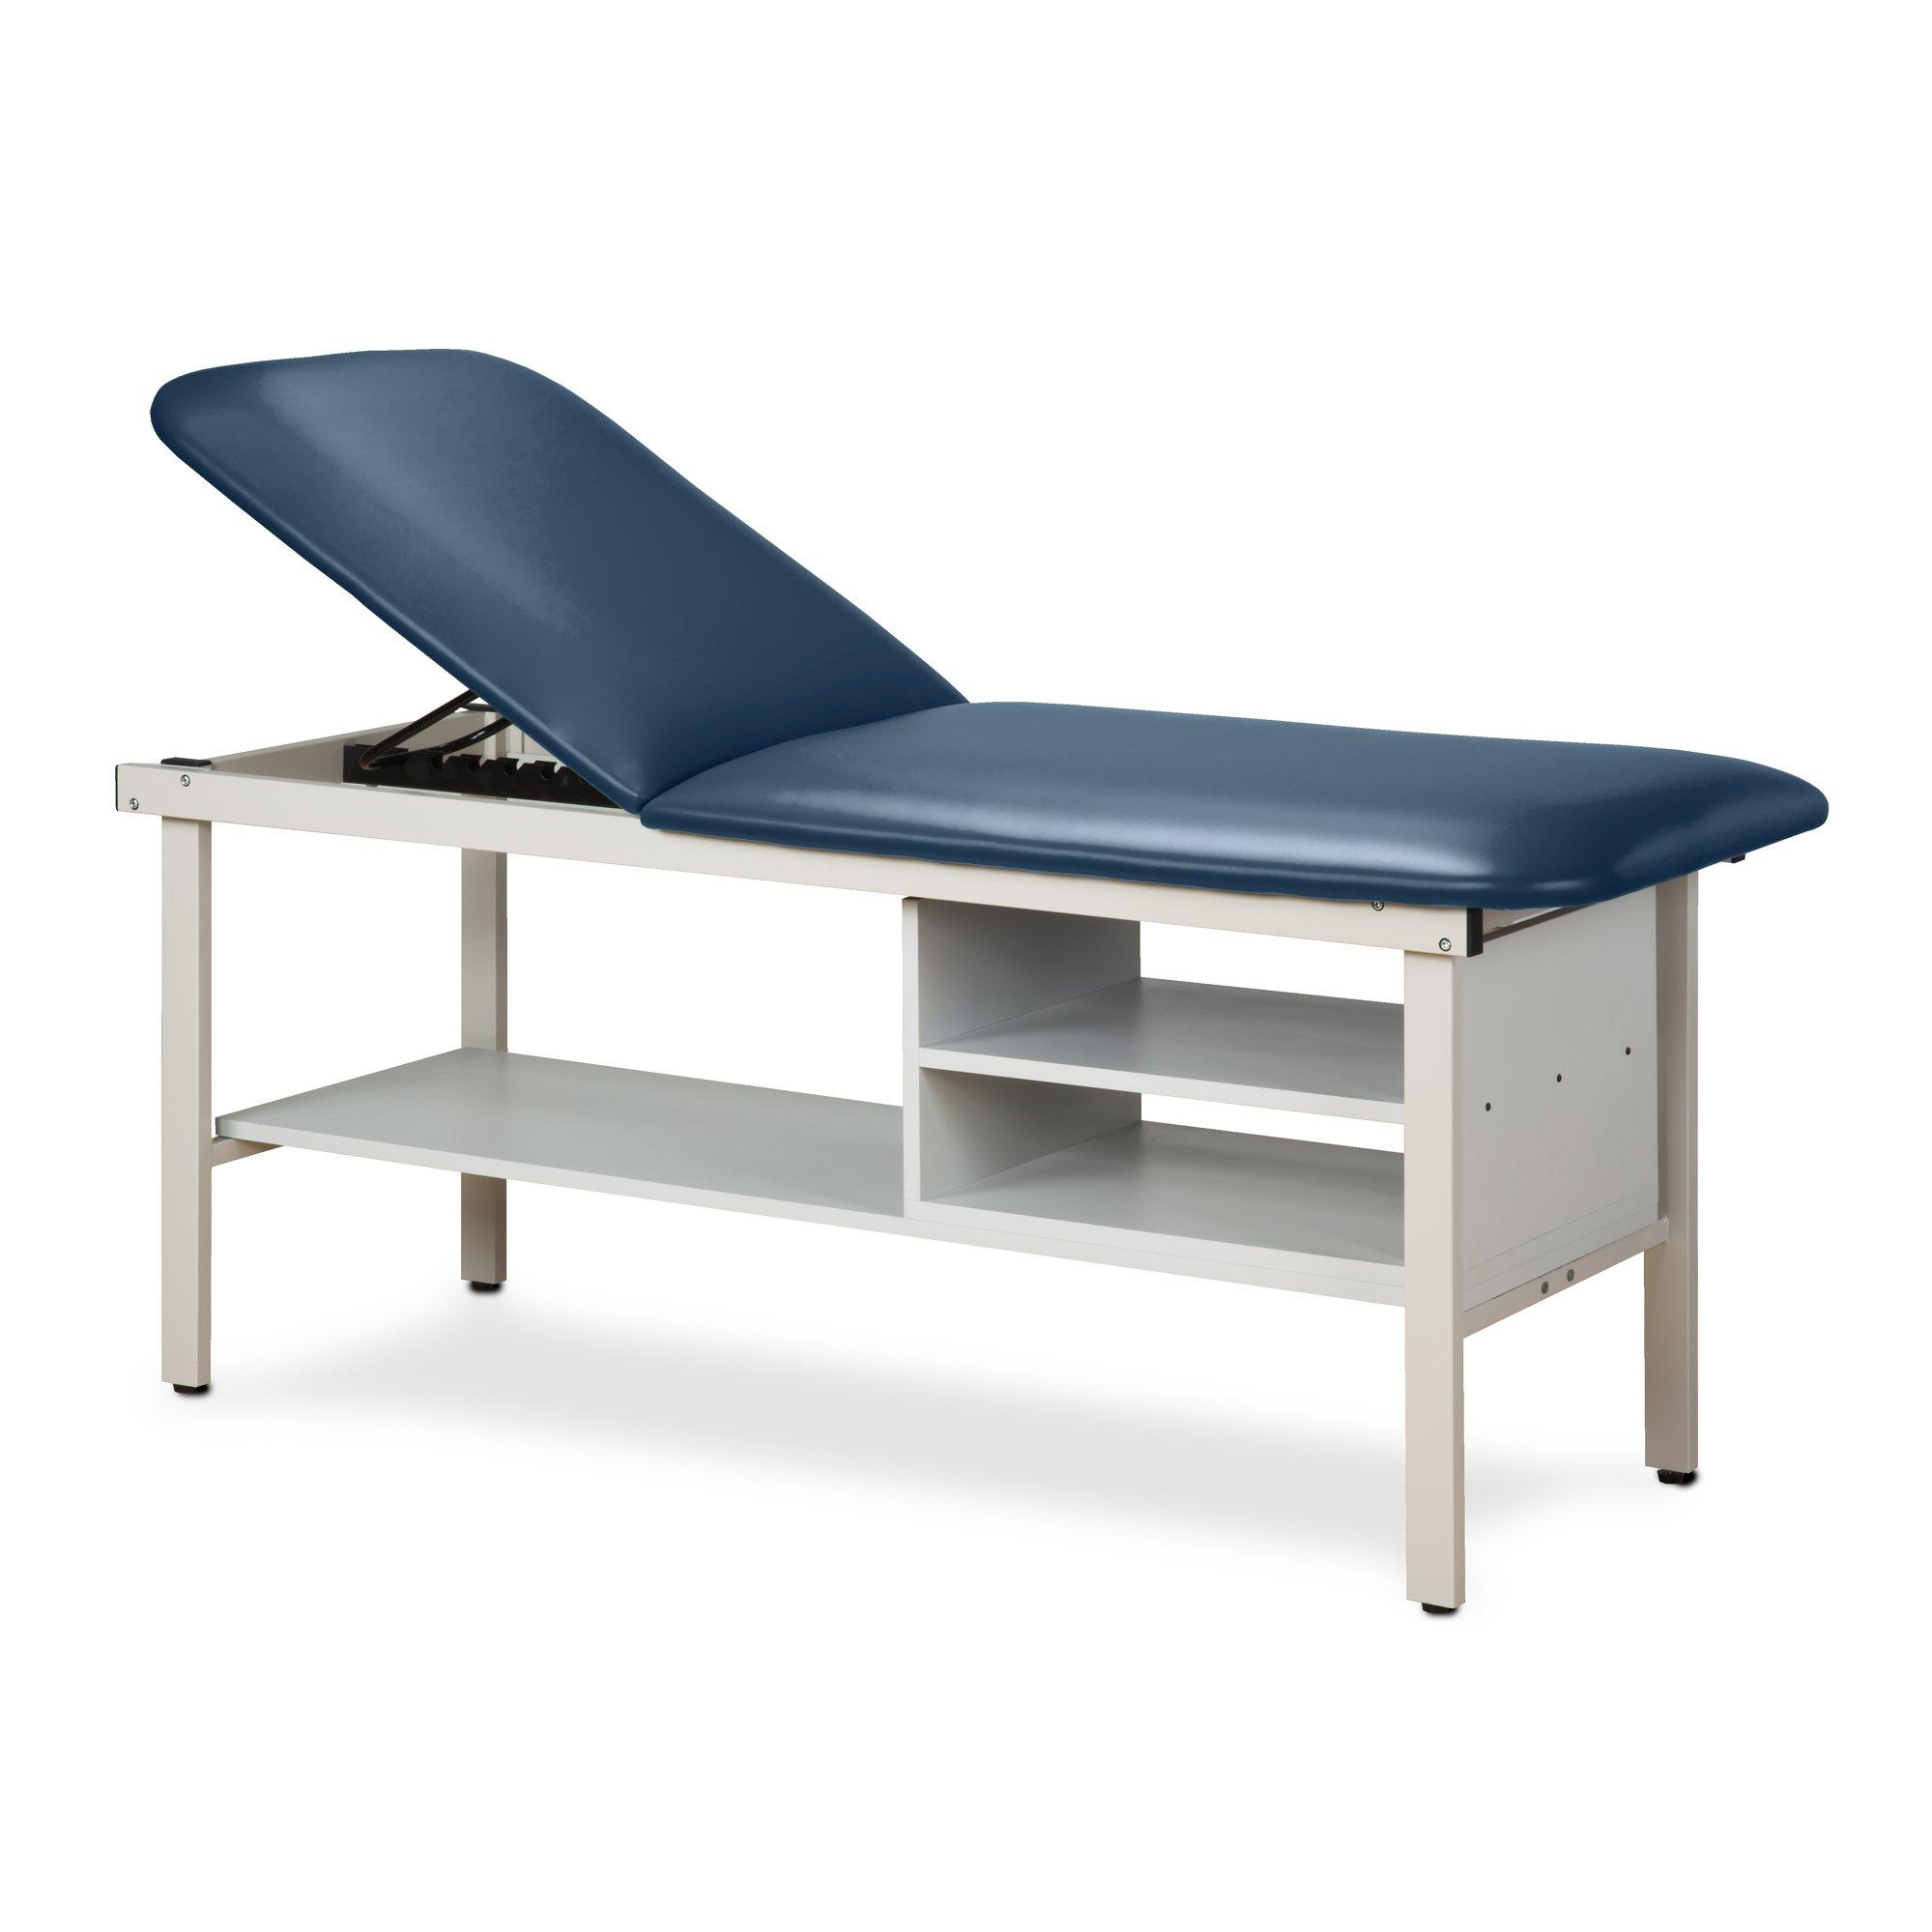 30'' Width Alpha Treatment Table with 2 shelves Royal Blue